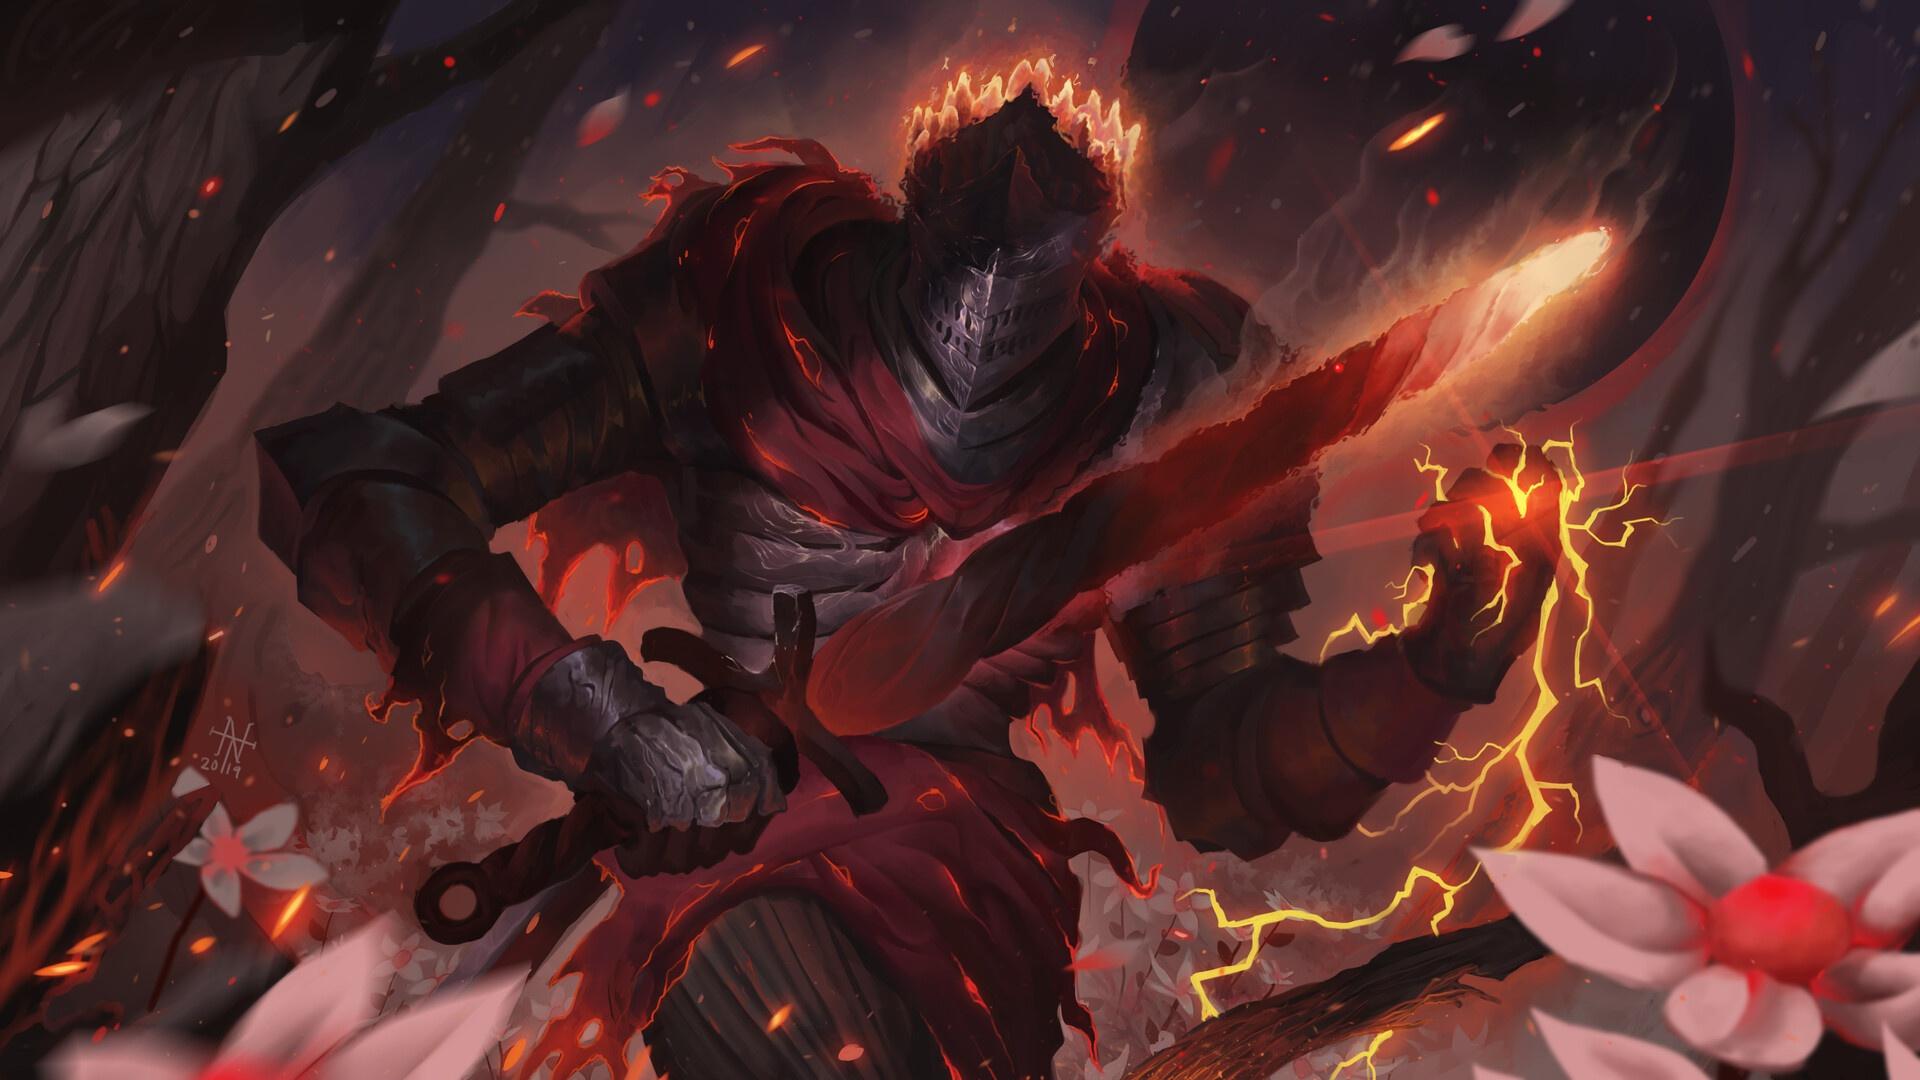 General 1920x1080 knight warrior fantasy art artwork Dark Souls dark souls 3 Soul of Cinder